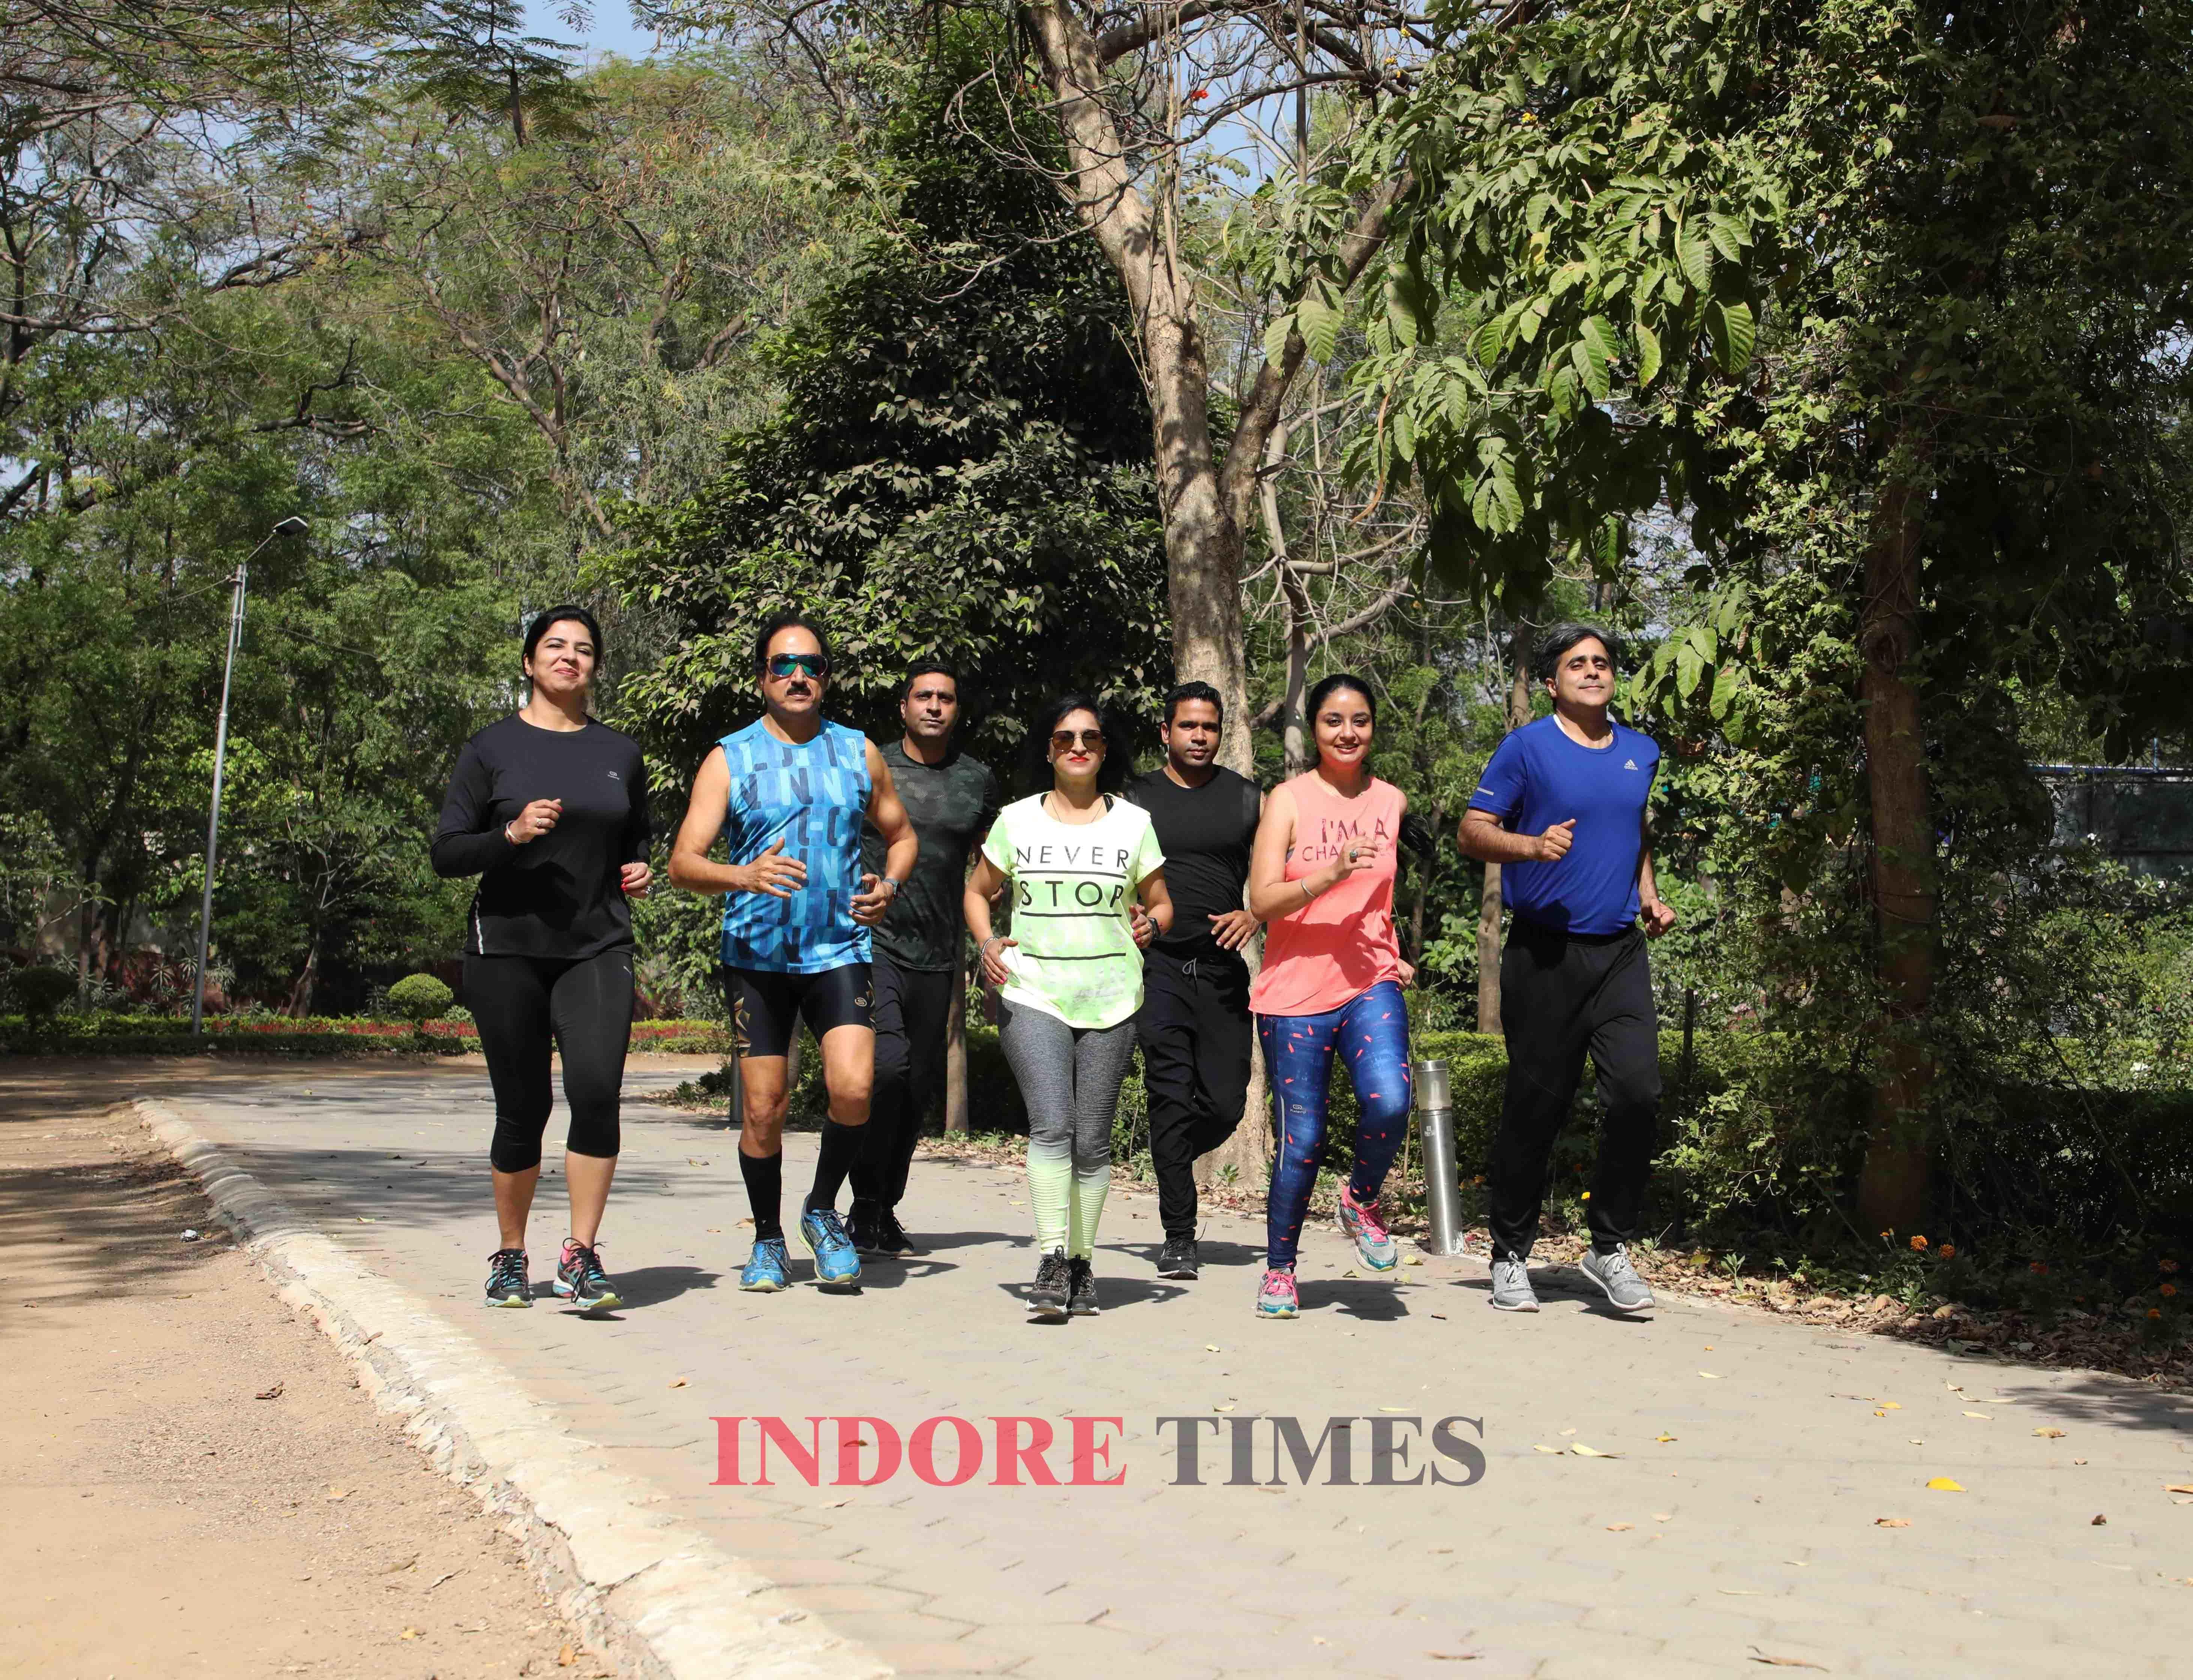 Surbhi Choudhary, Aarti Maheshwari, Neeraj Bhansali, Chandresh Jhurani, Arun Agrawal , Nidhi and Rohit Juneja (4)_edit